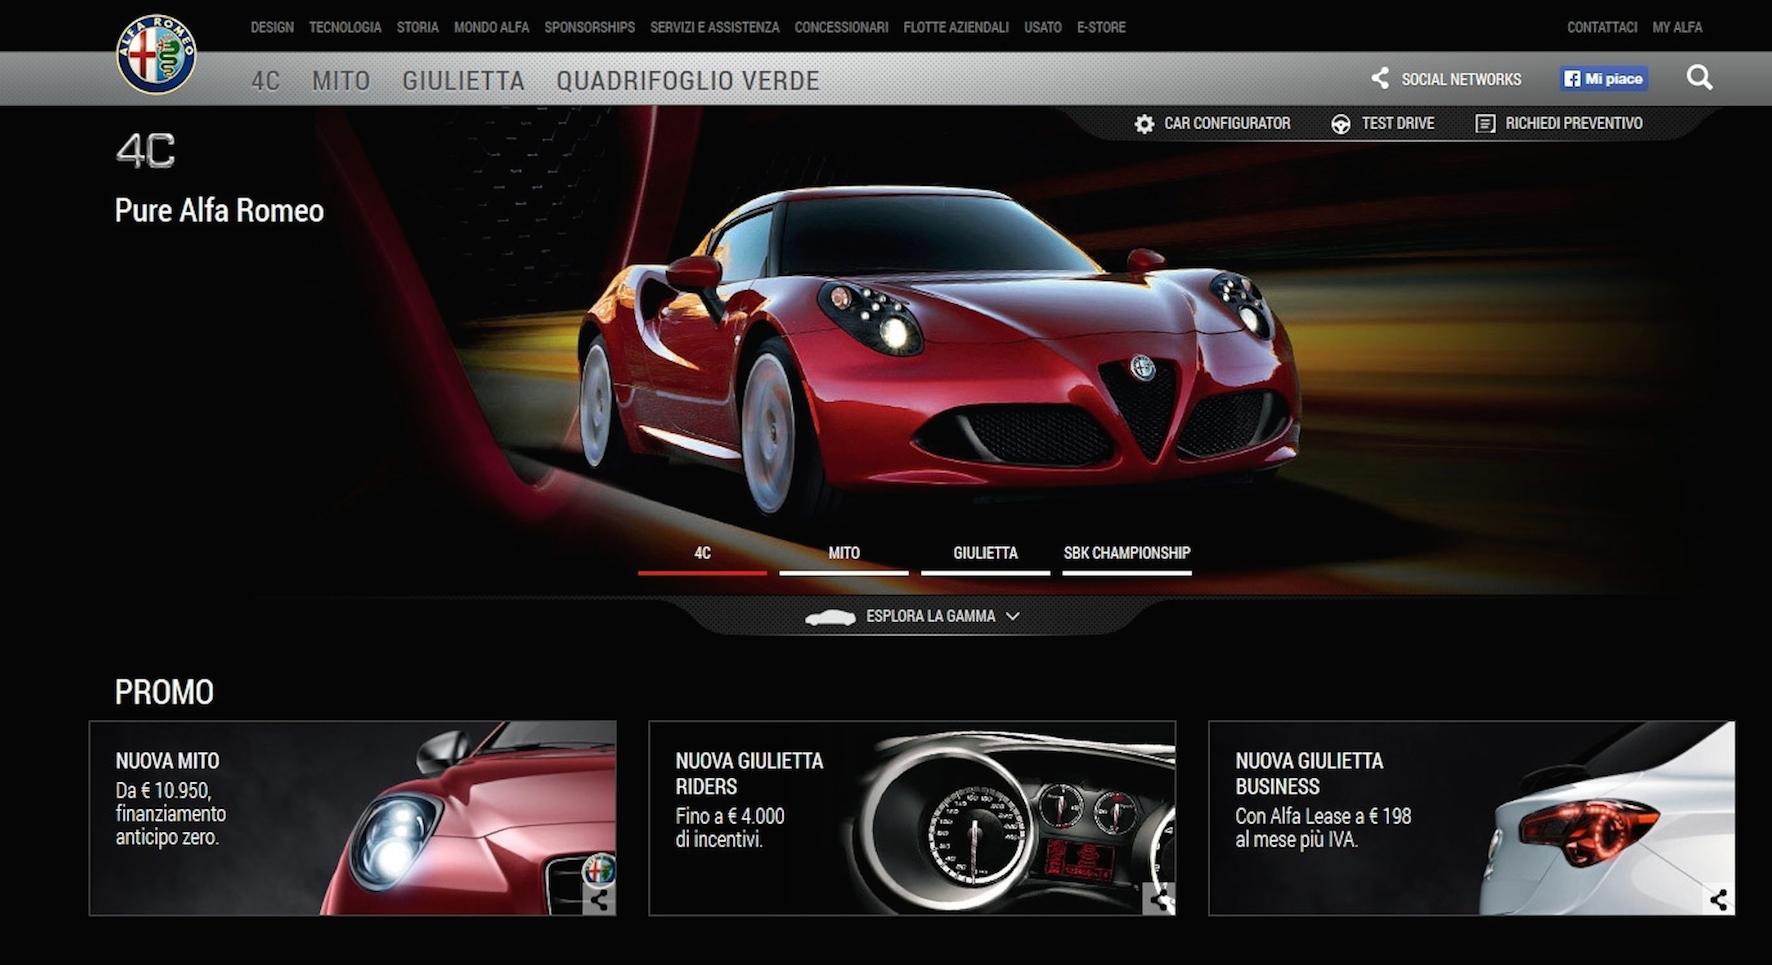 Wedoo vince ancora con Alfa Romeo 4C